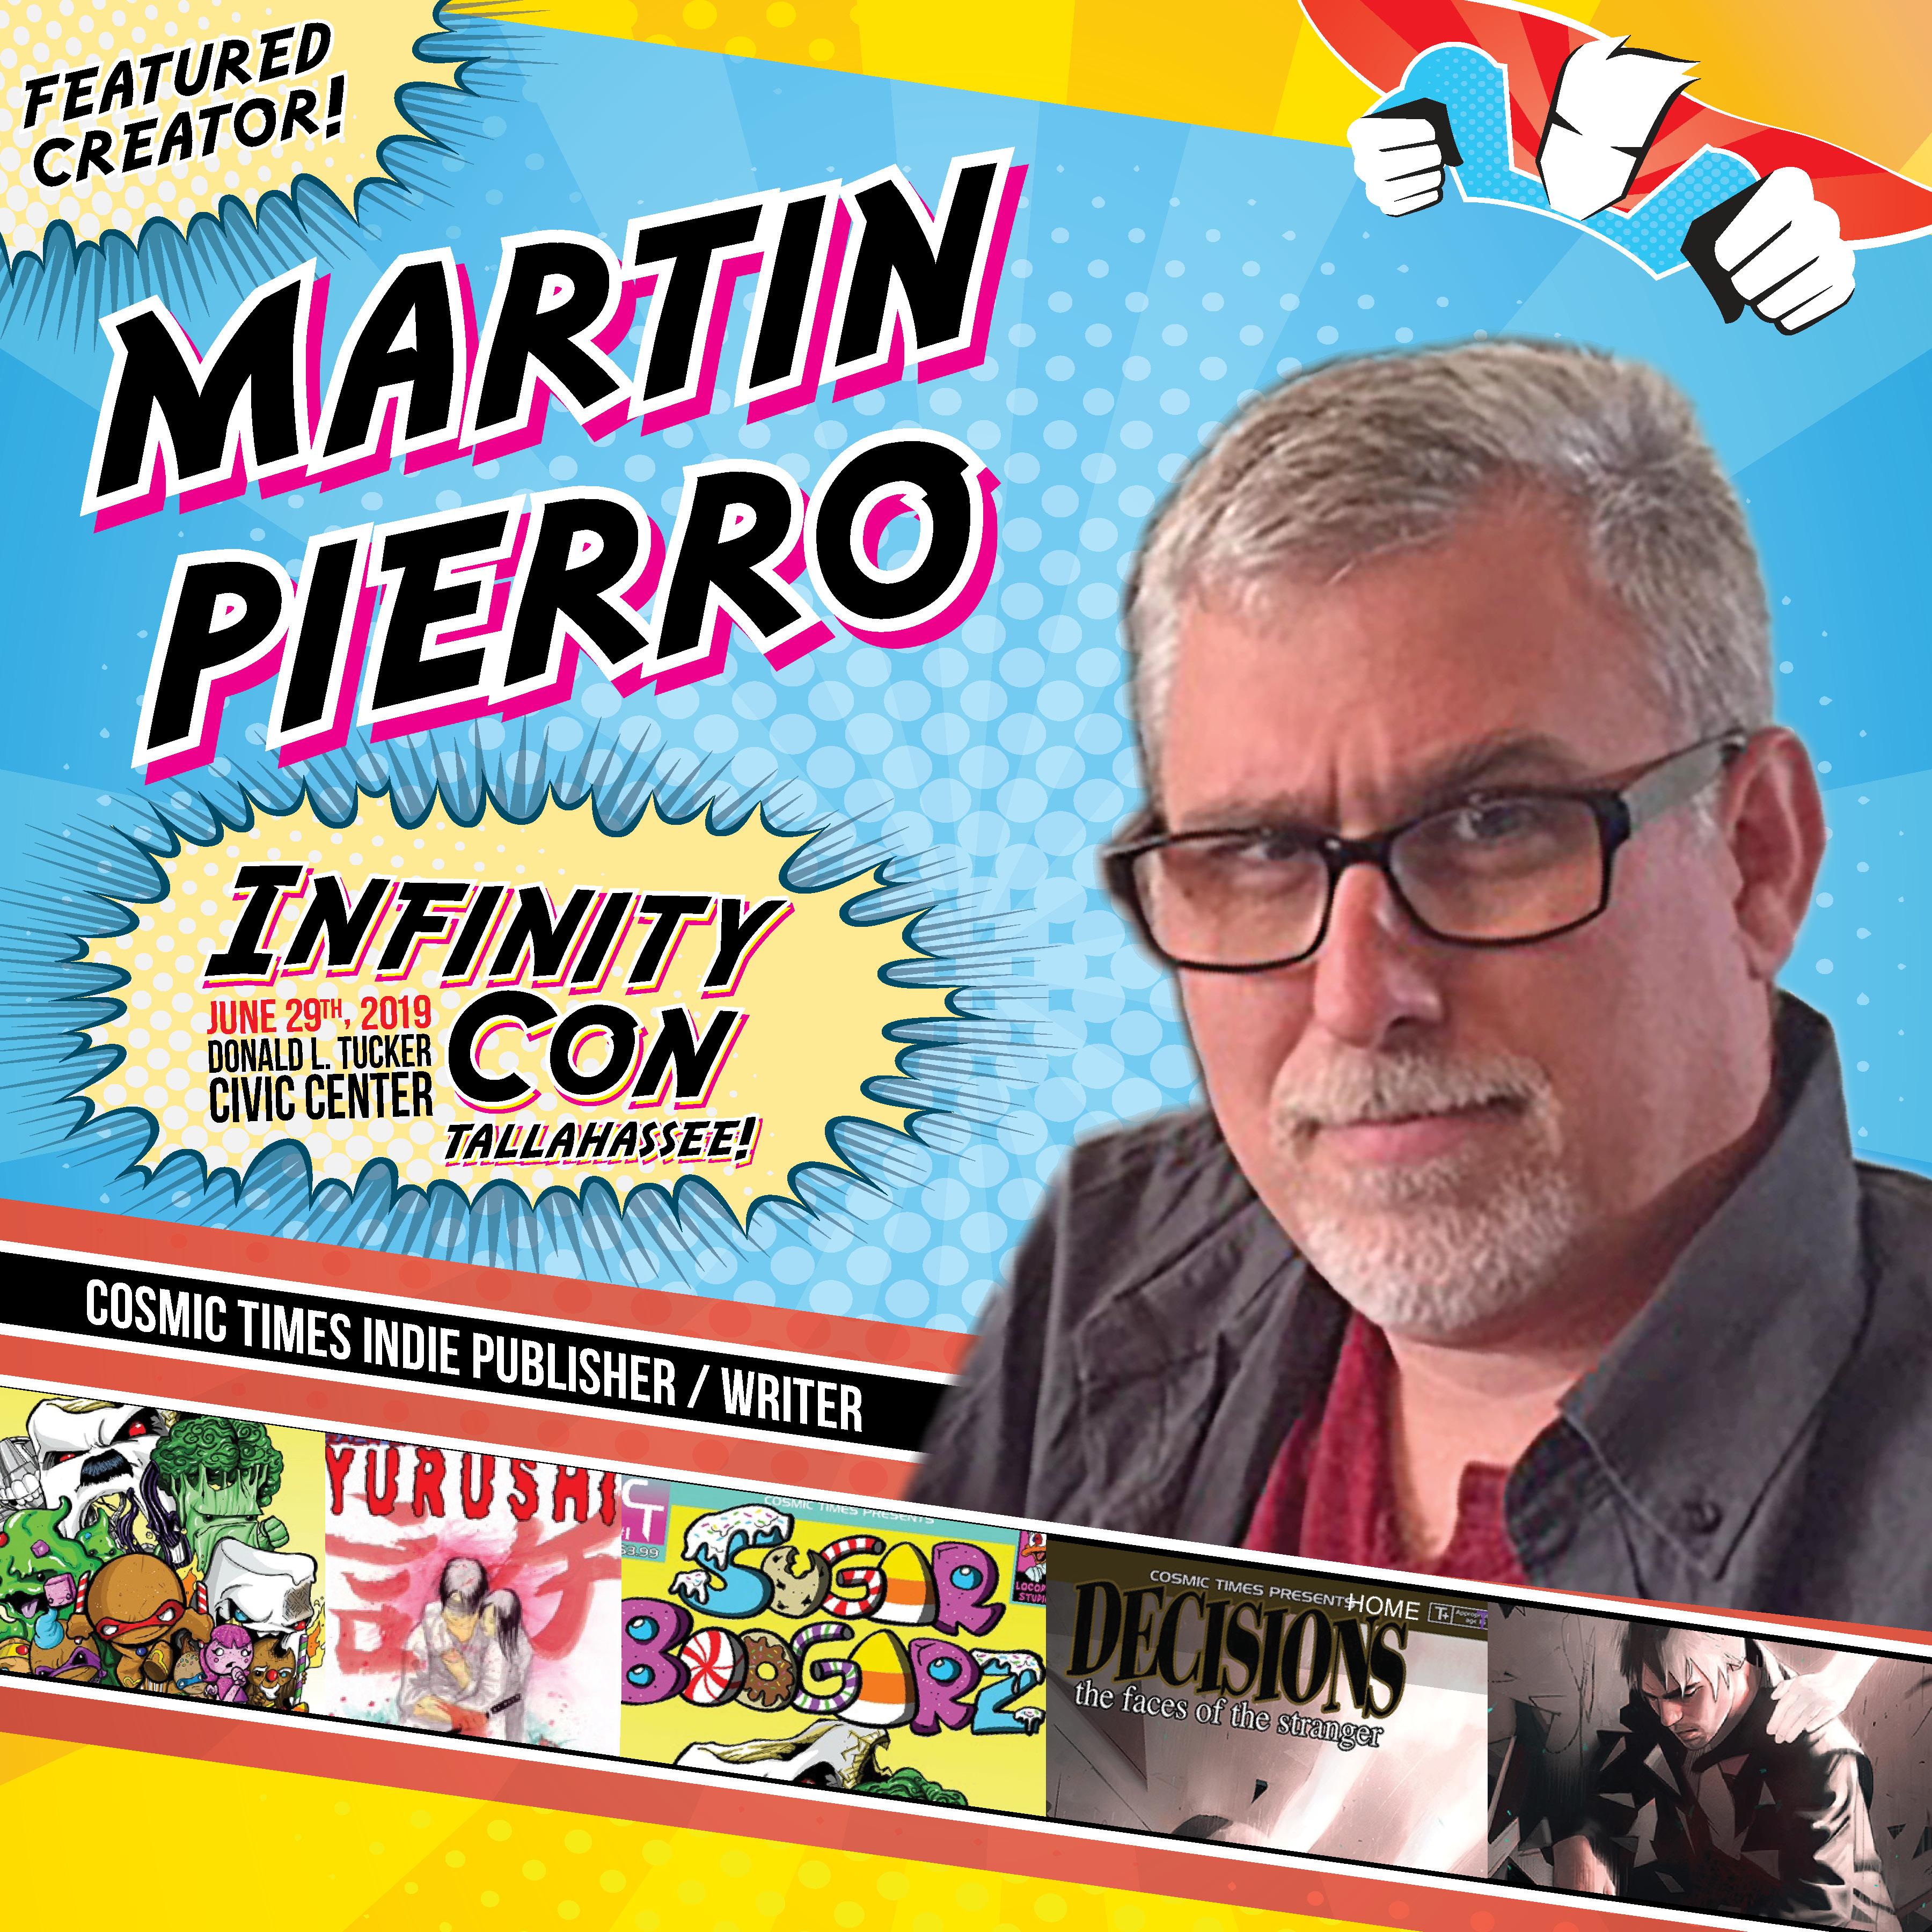 Martin Pierro